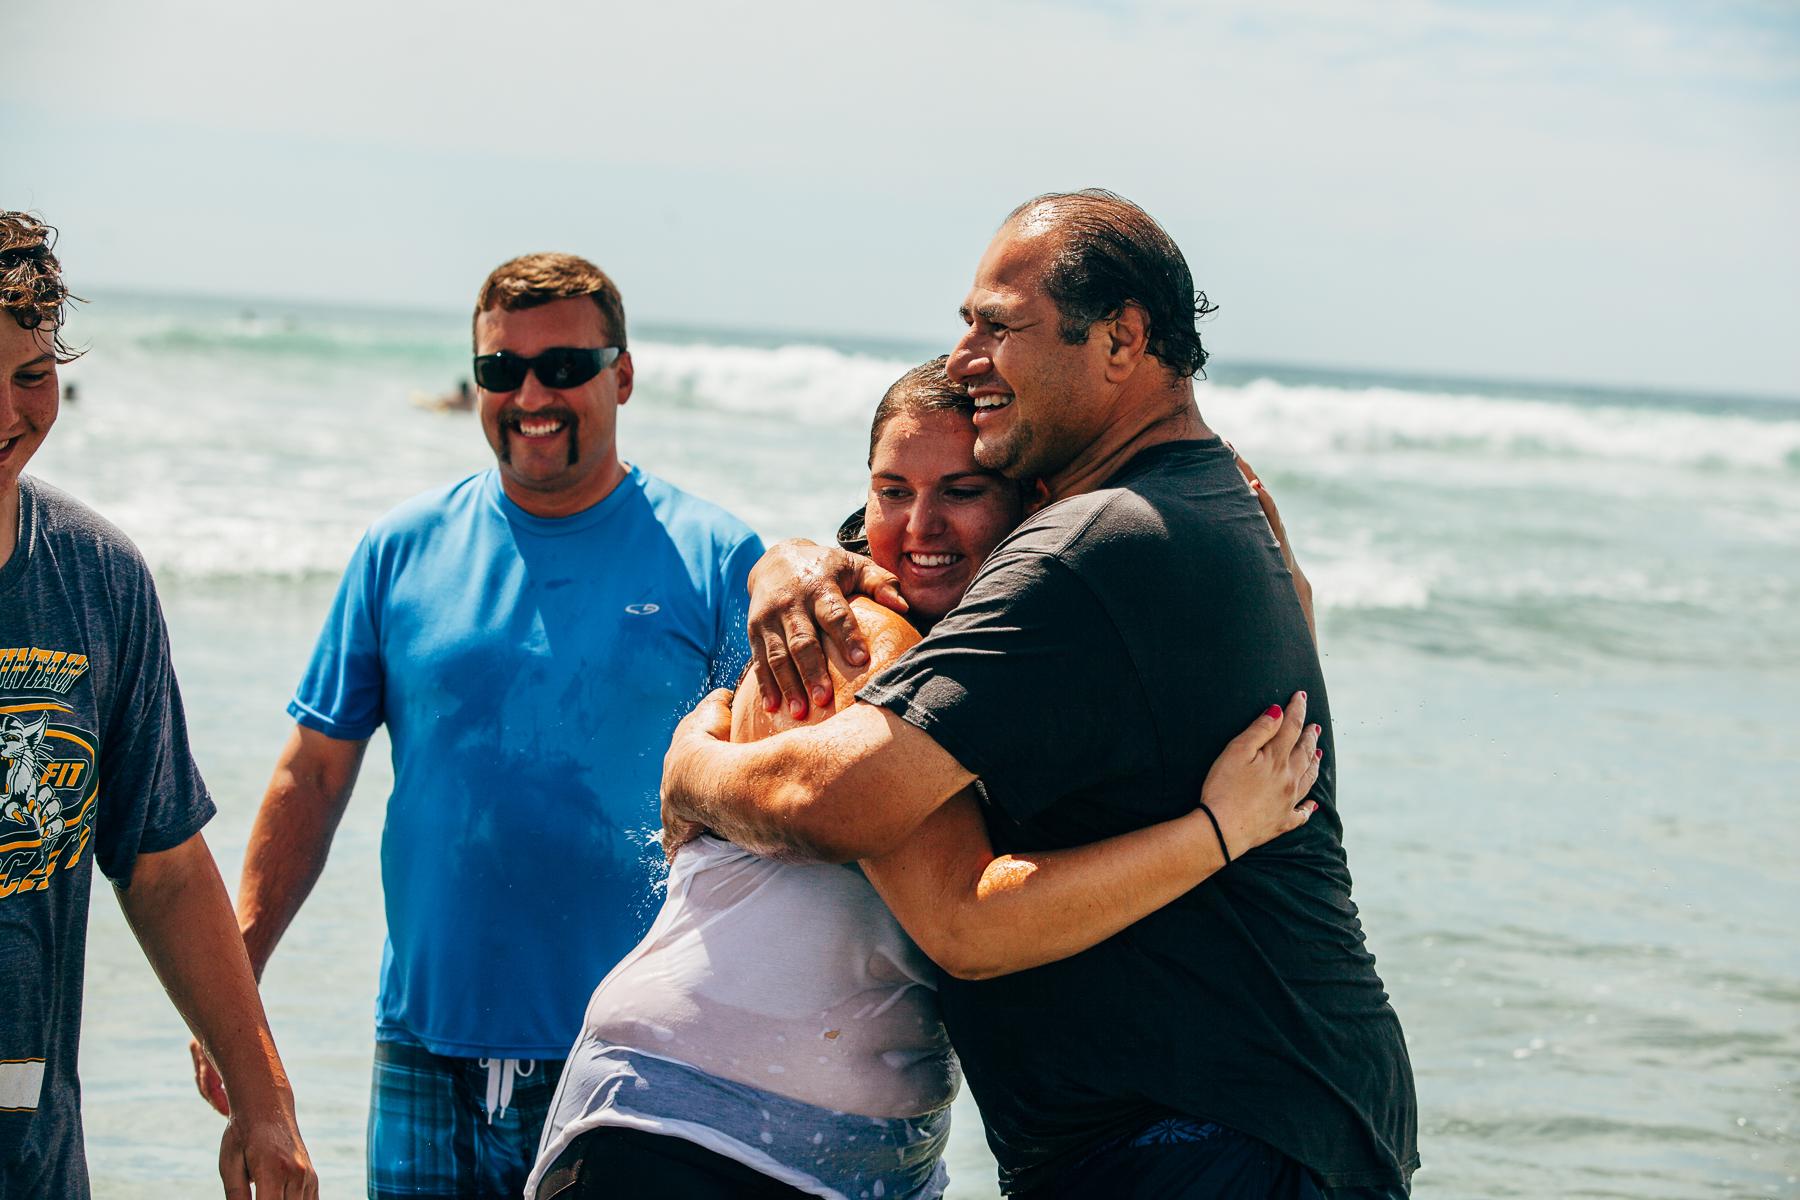 Beach_Baptism_2015_59.jpg